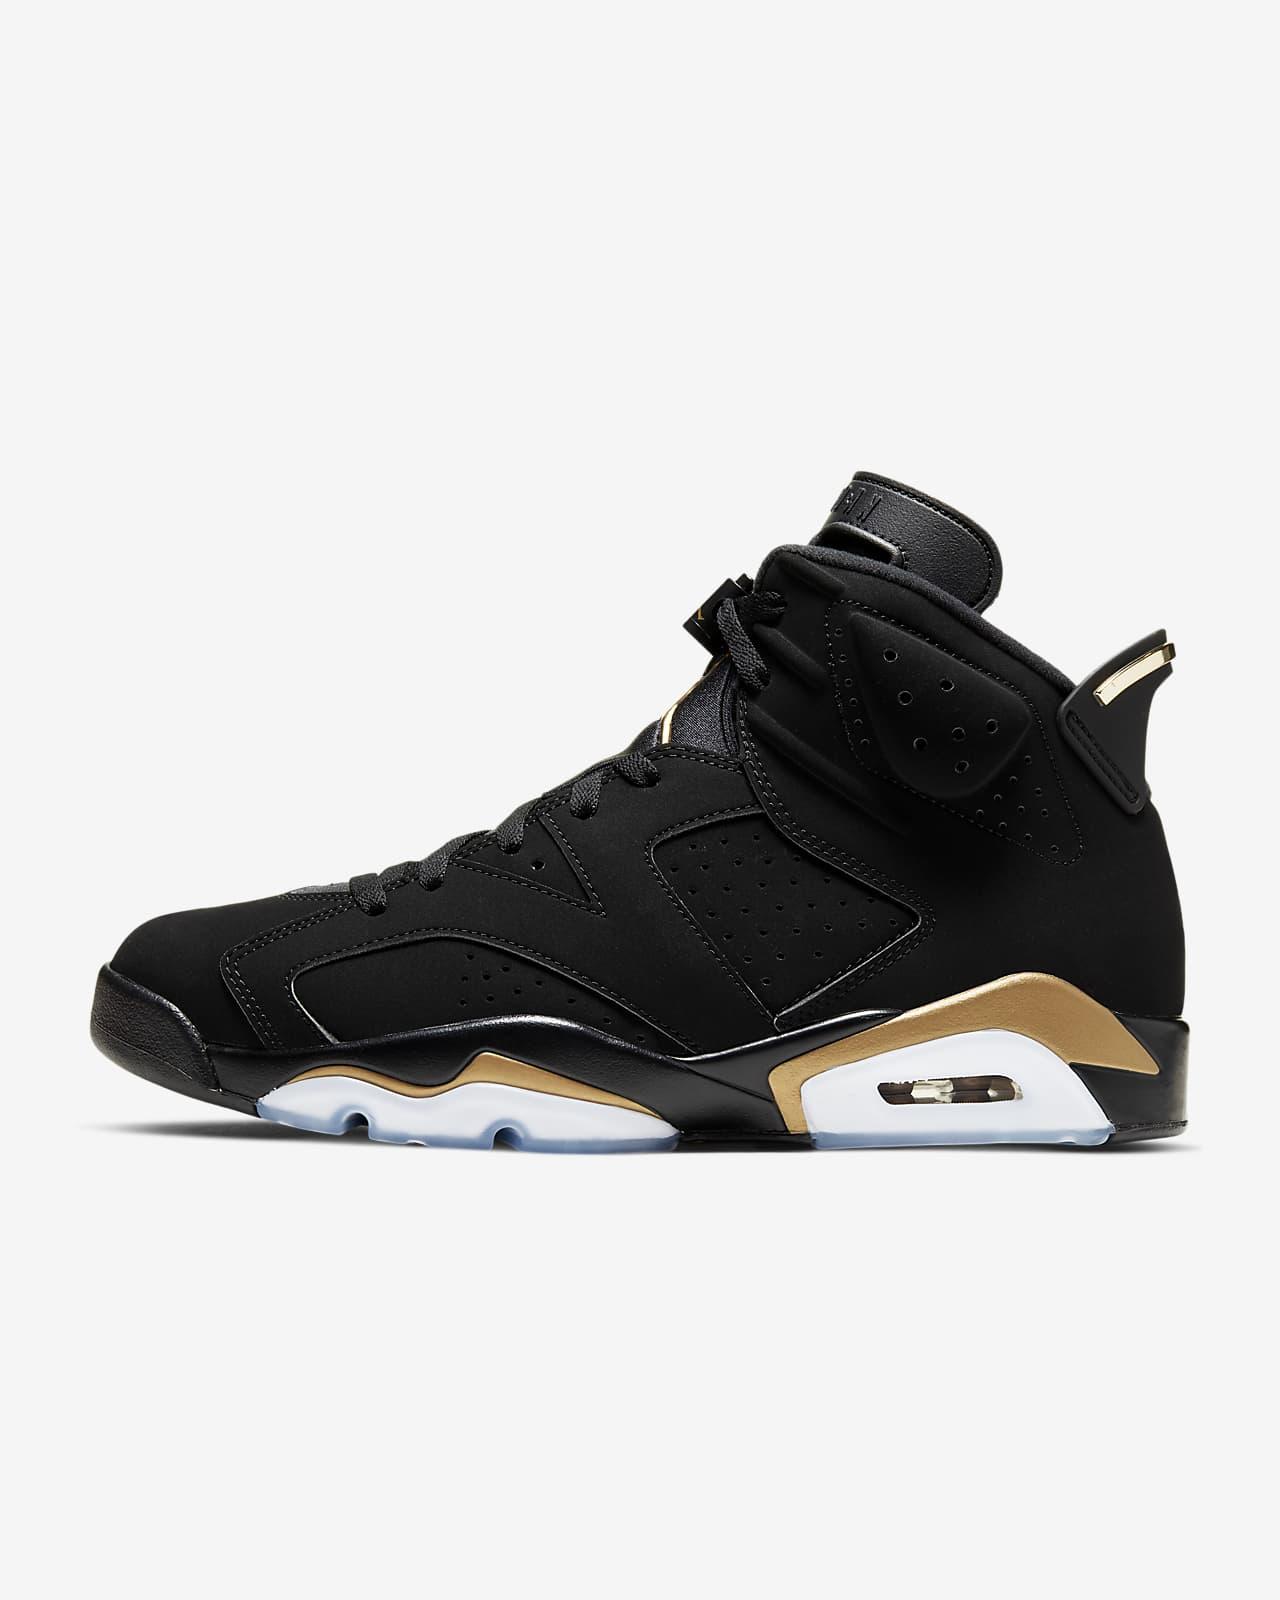 Air Jordan 6 Retro DMP Men's Shoes